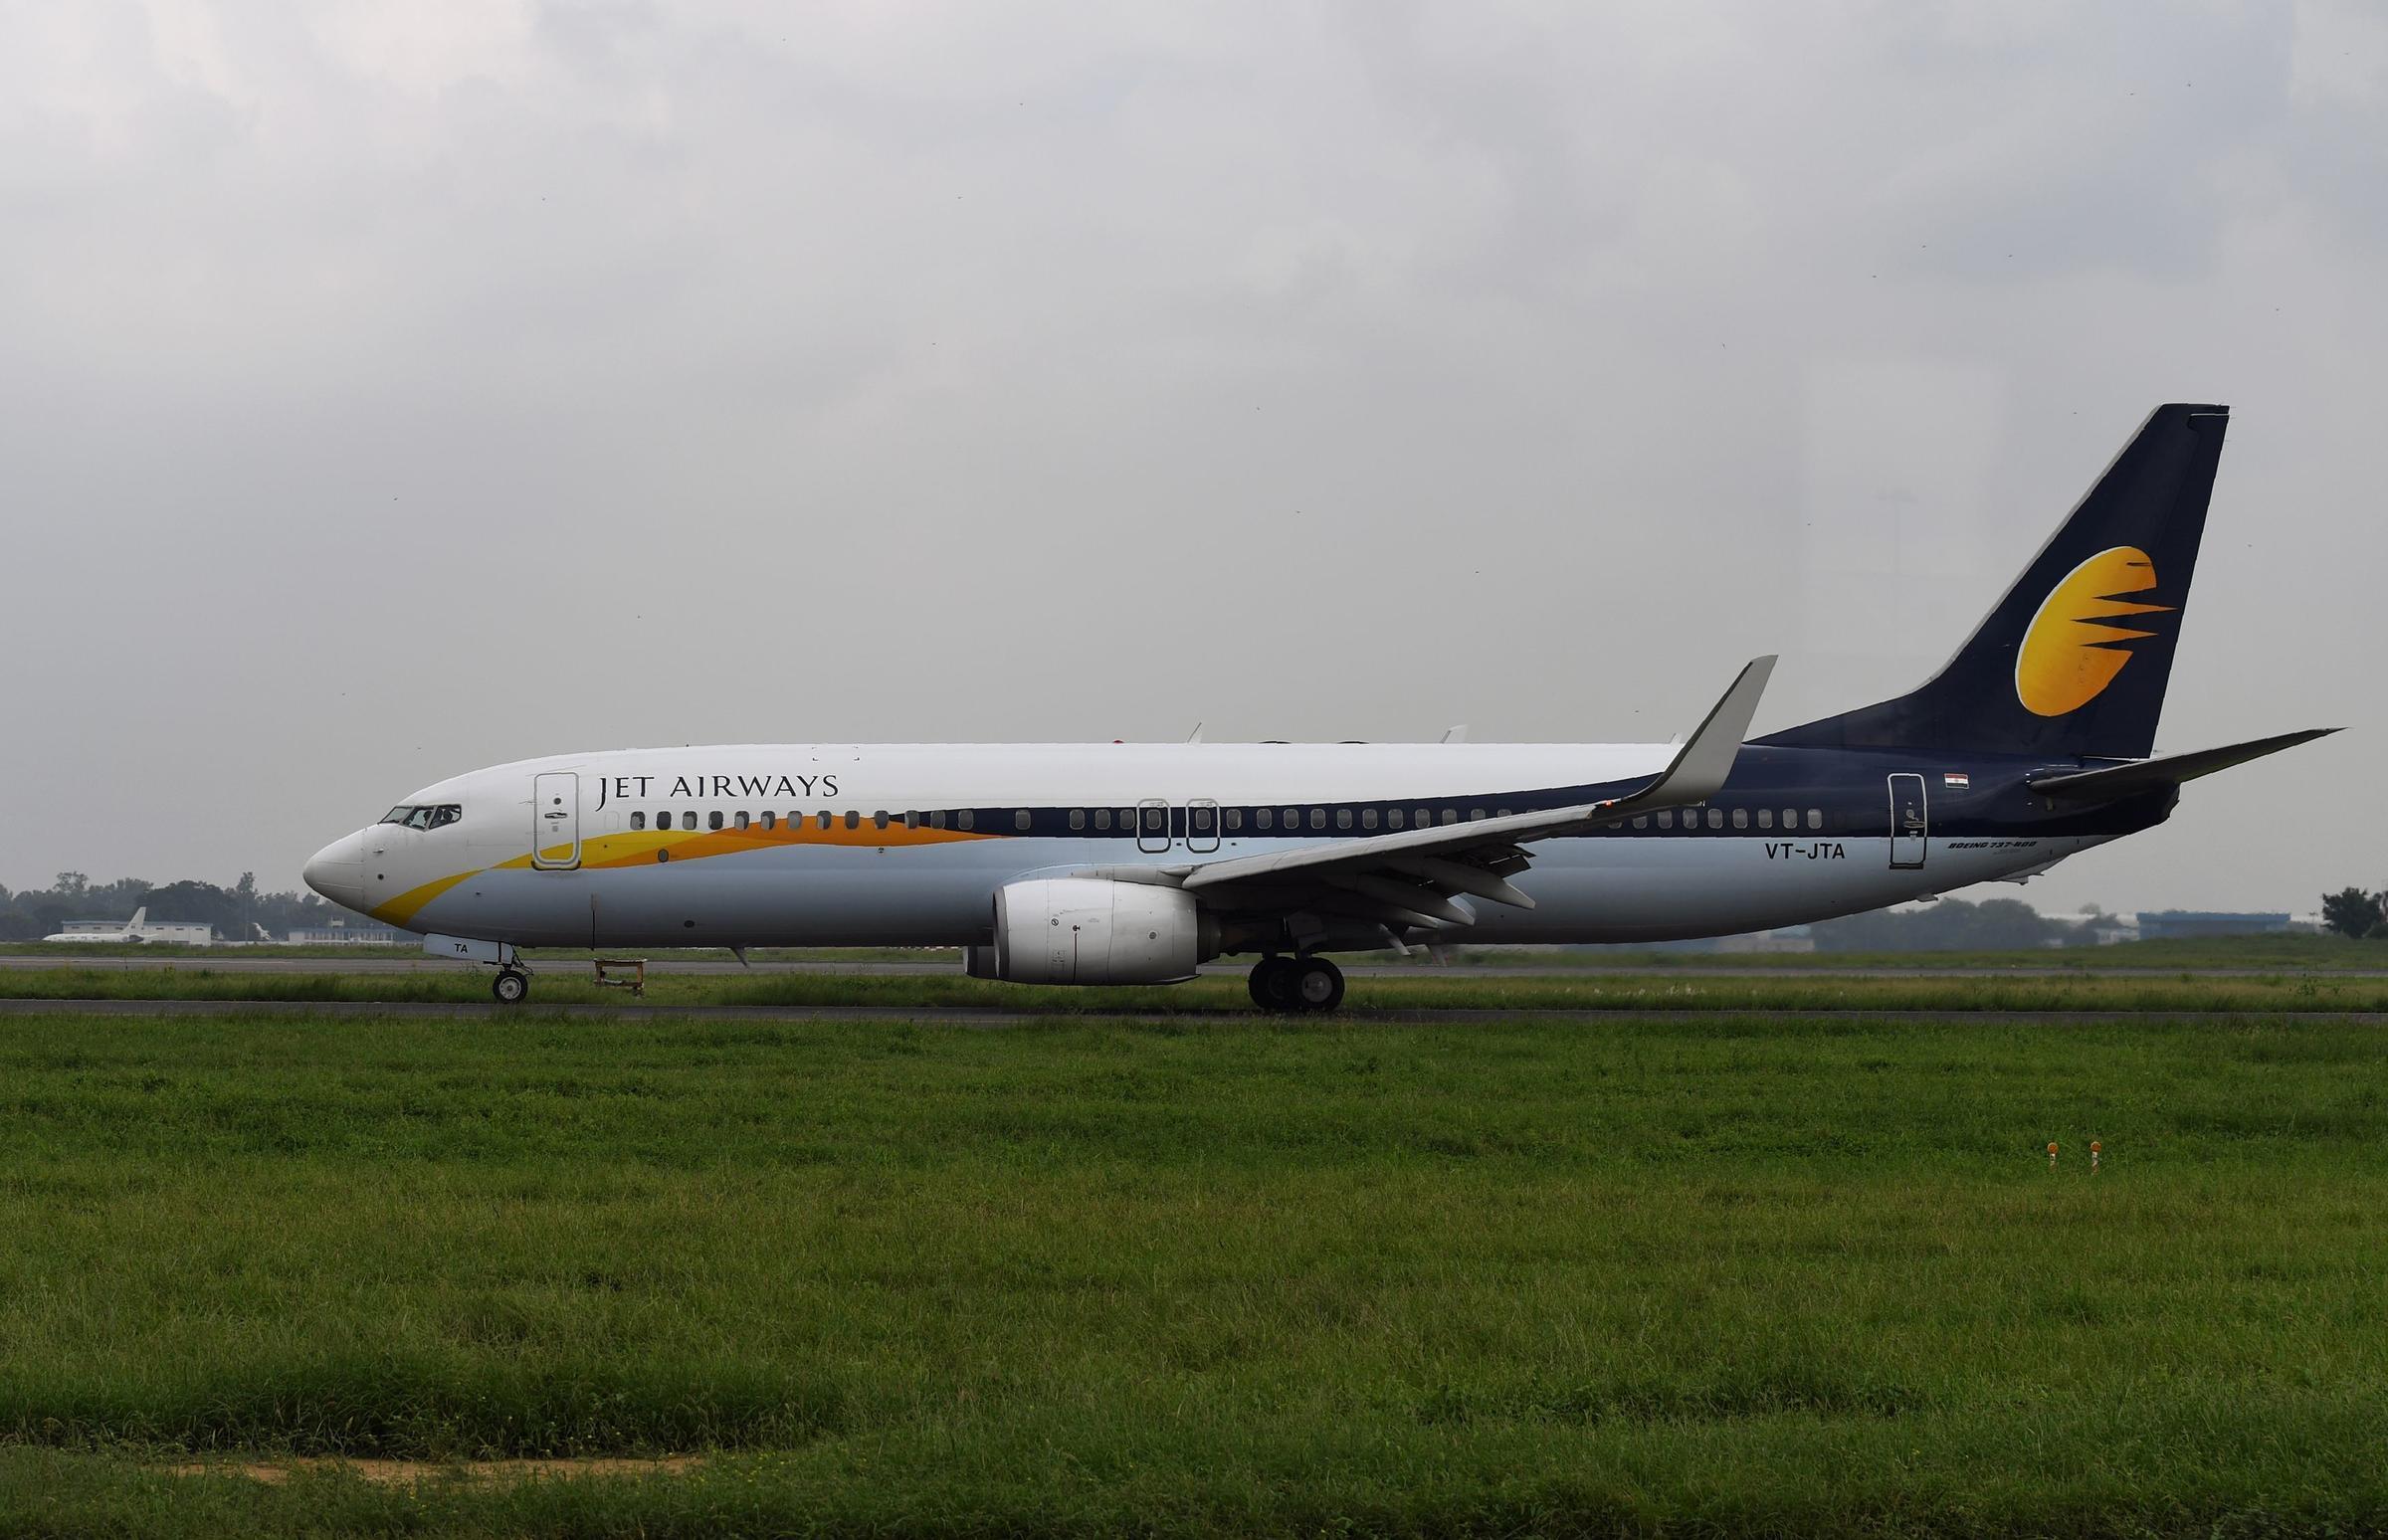 Indian Authorities Say Flight Crew Forgot To Pressurize